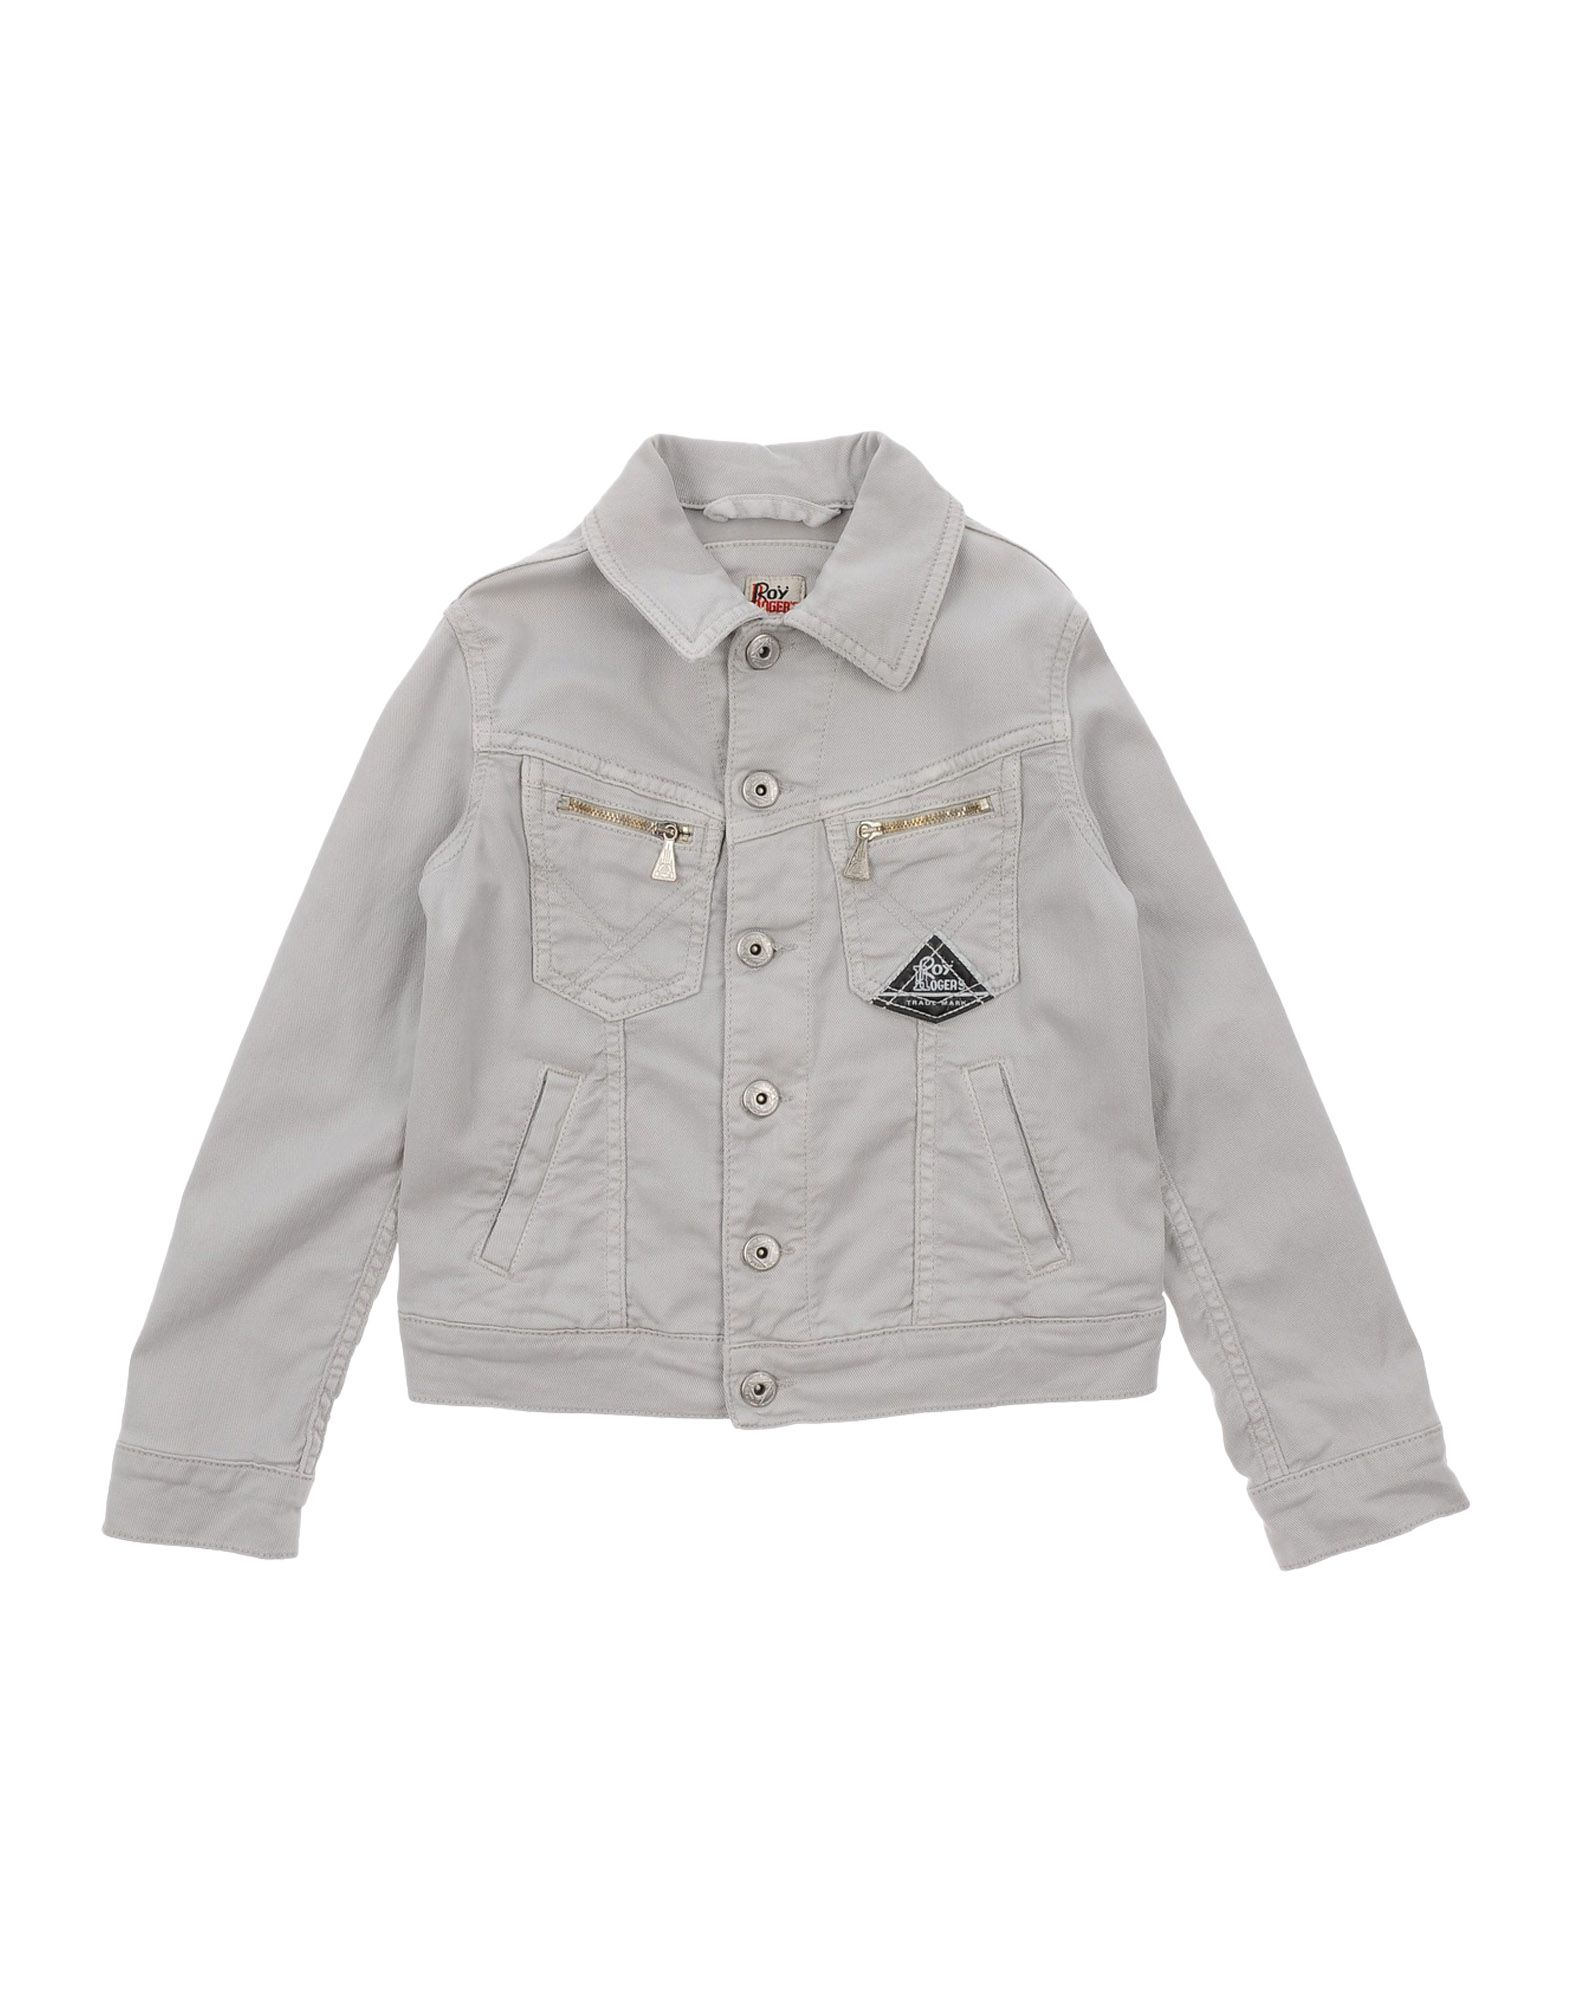 ROŸ ROGER´S Jungen 3-8 jahre Jeansjacke/-mantel Farbe Hellgrau Größe 4